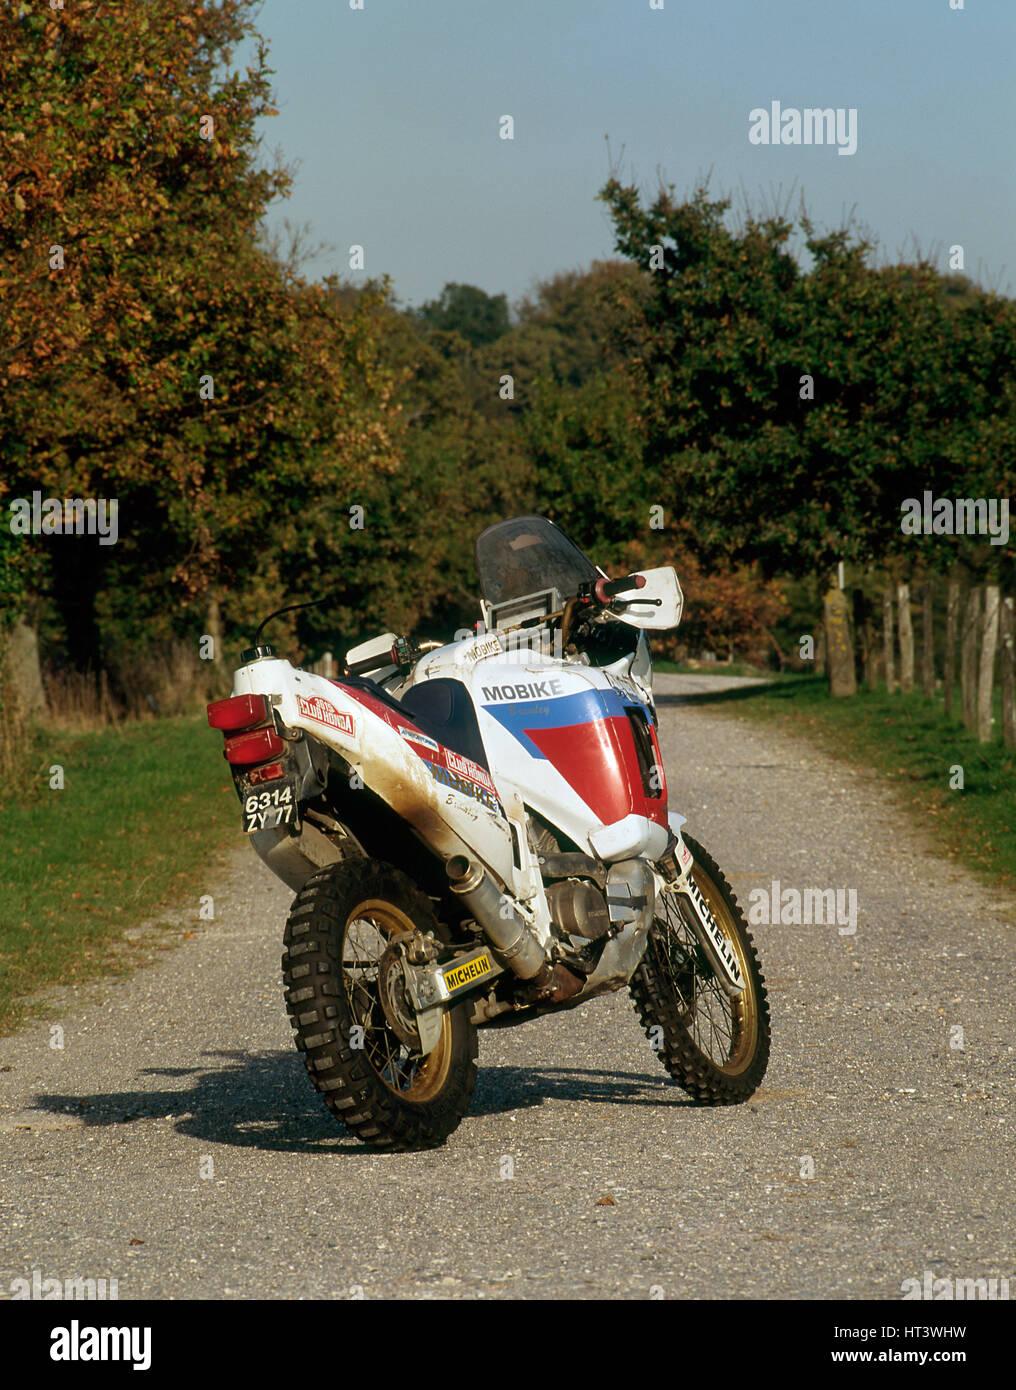 1991 Honda 750 Africa Twin Artist Unknown Stock Photo Alamy